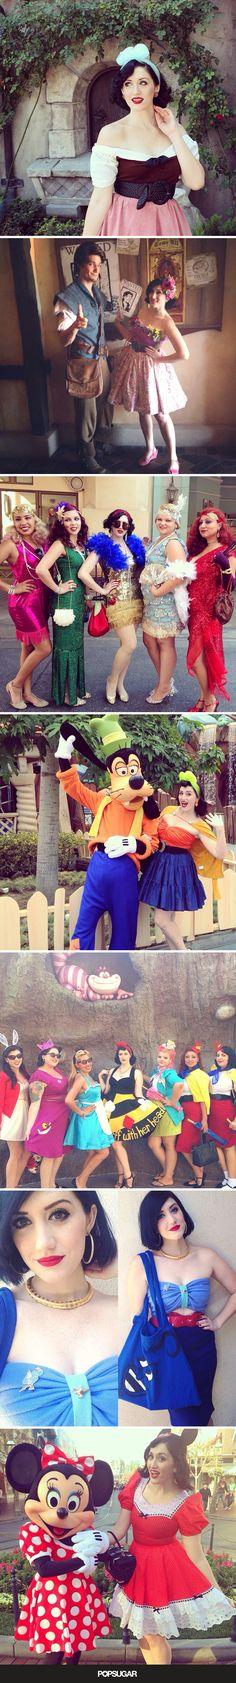 An Undercover Disney Princess Shares the Secrets of Disneybounding